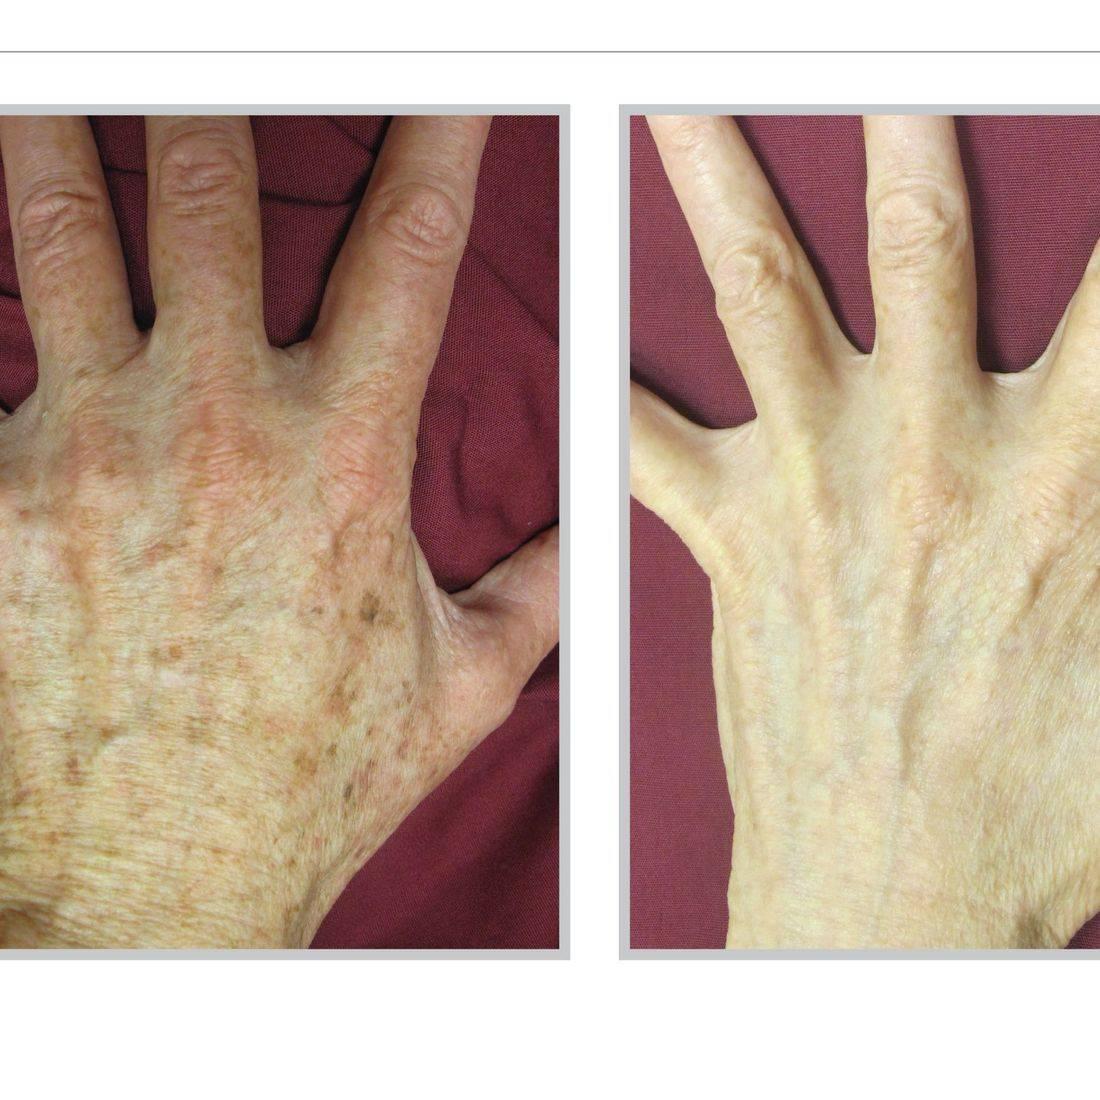 BBL Treatment Sciton Laser Reverse Aging Anti Aging Sun Spot